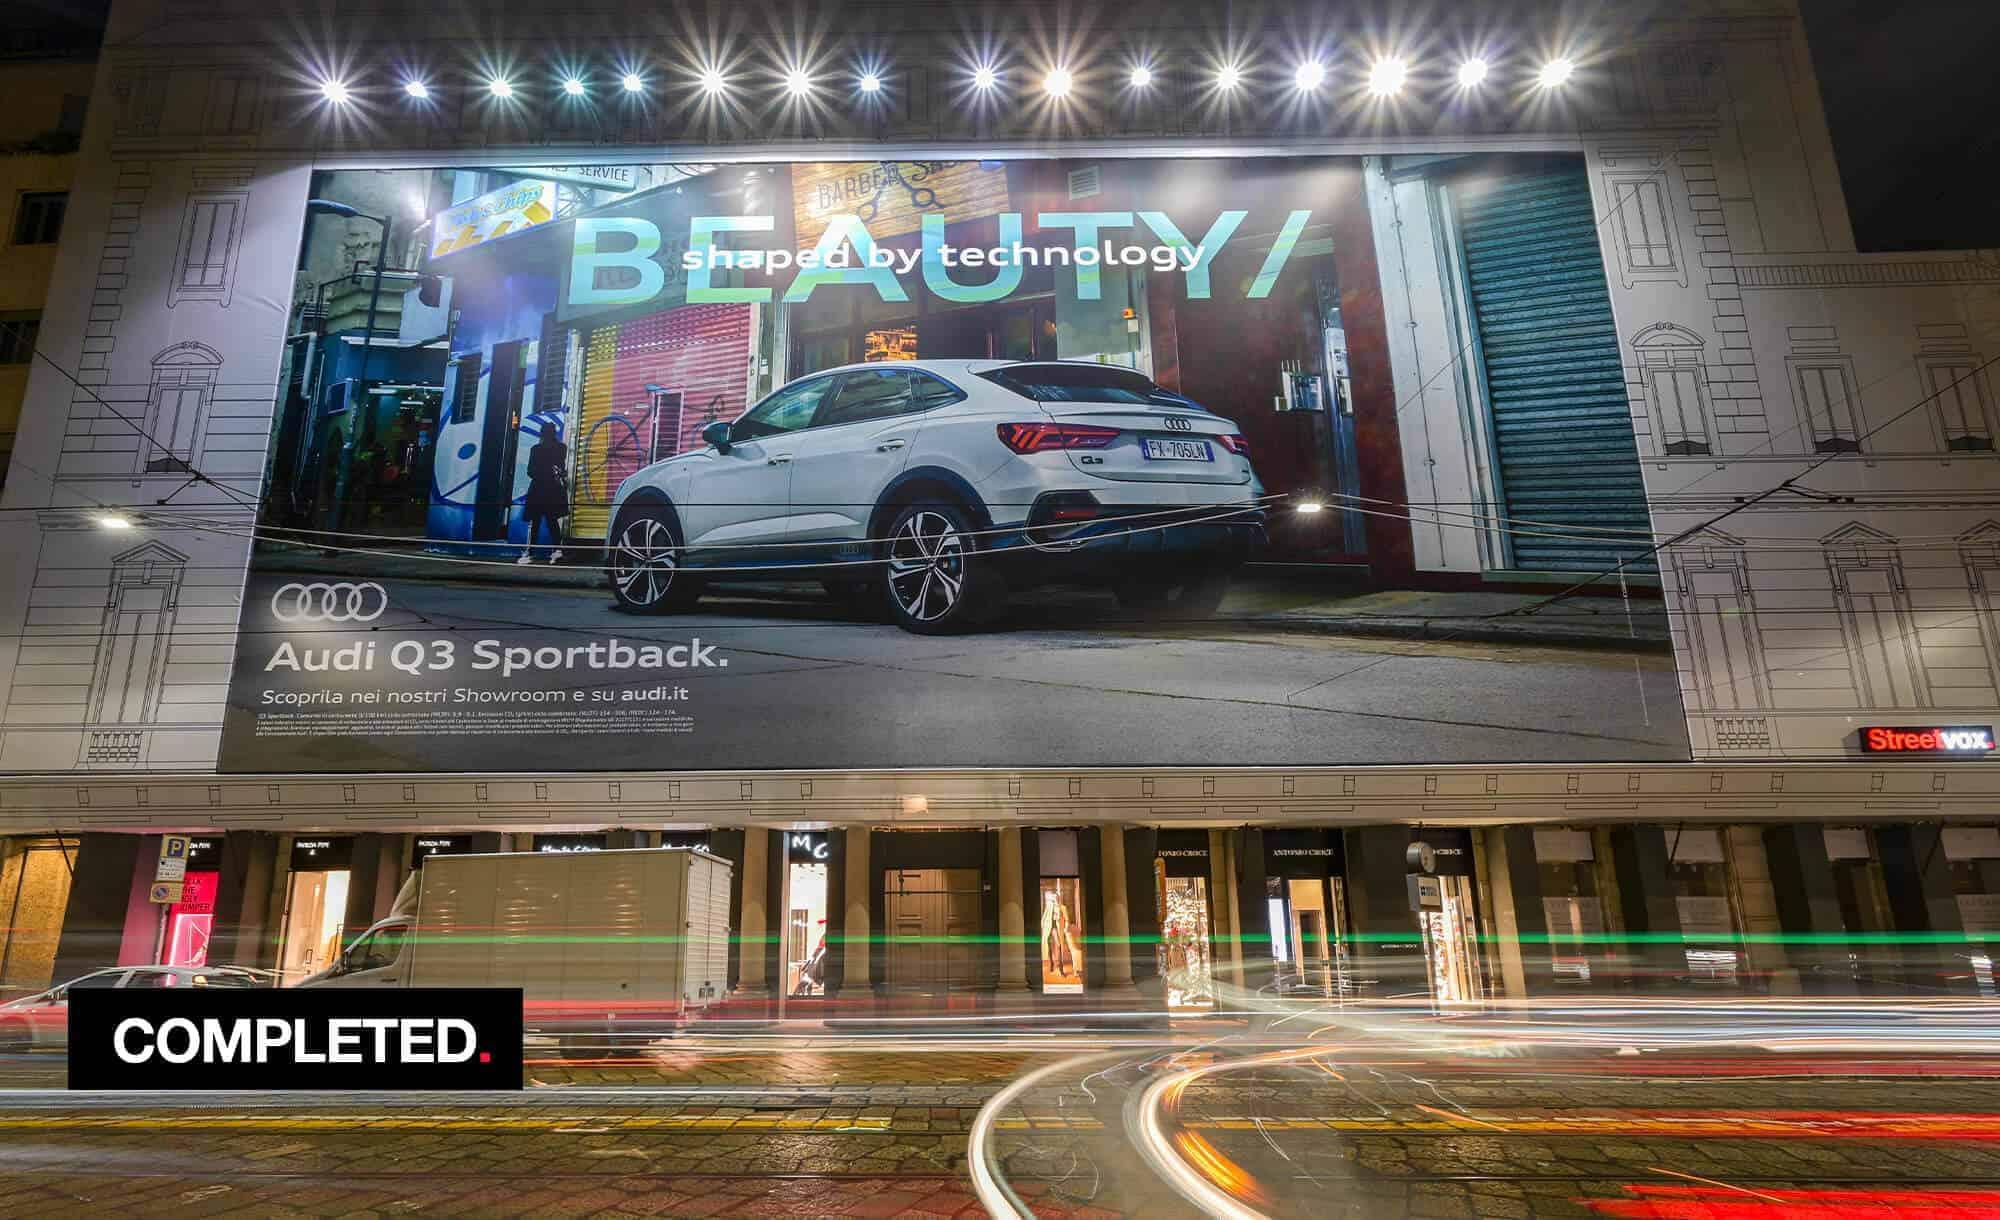 Maxi Affisione a Milano in Via Manzoni 38 di Audi (Automotivet)